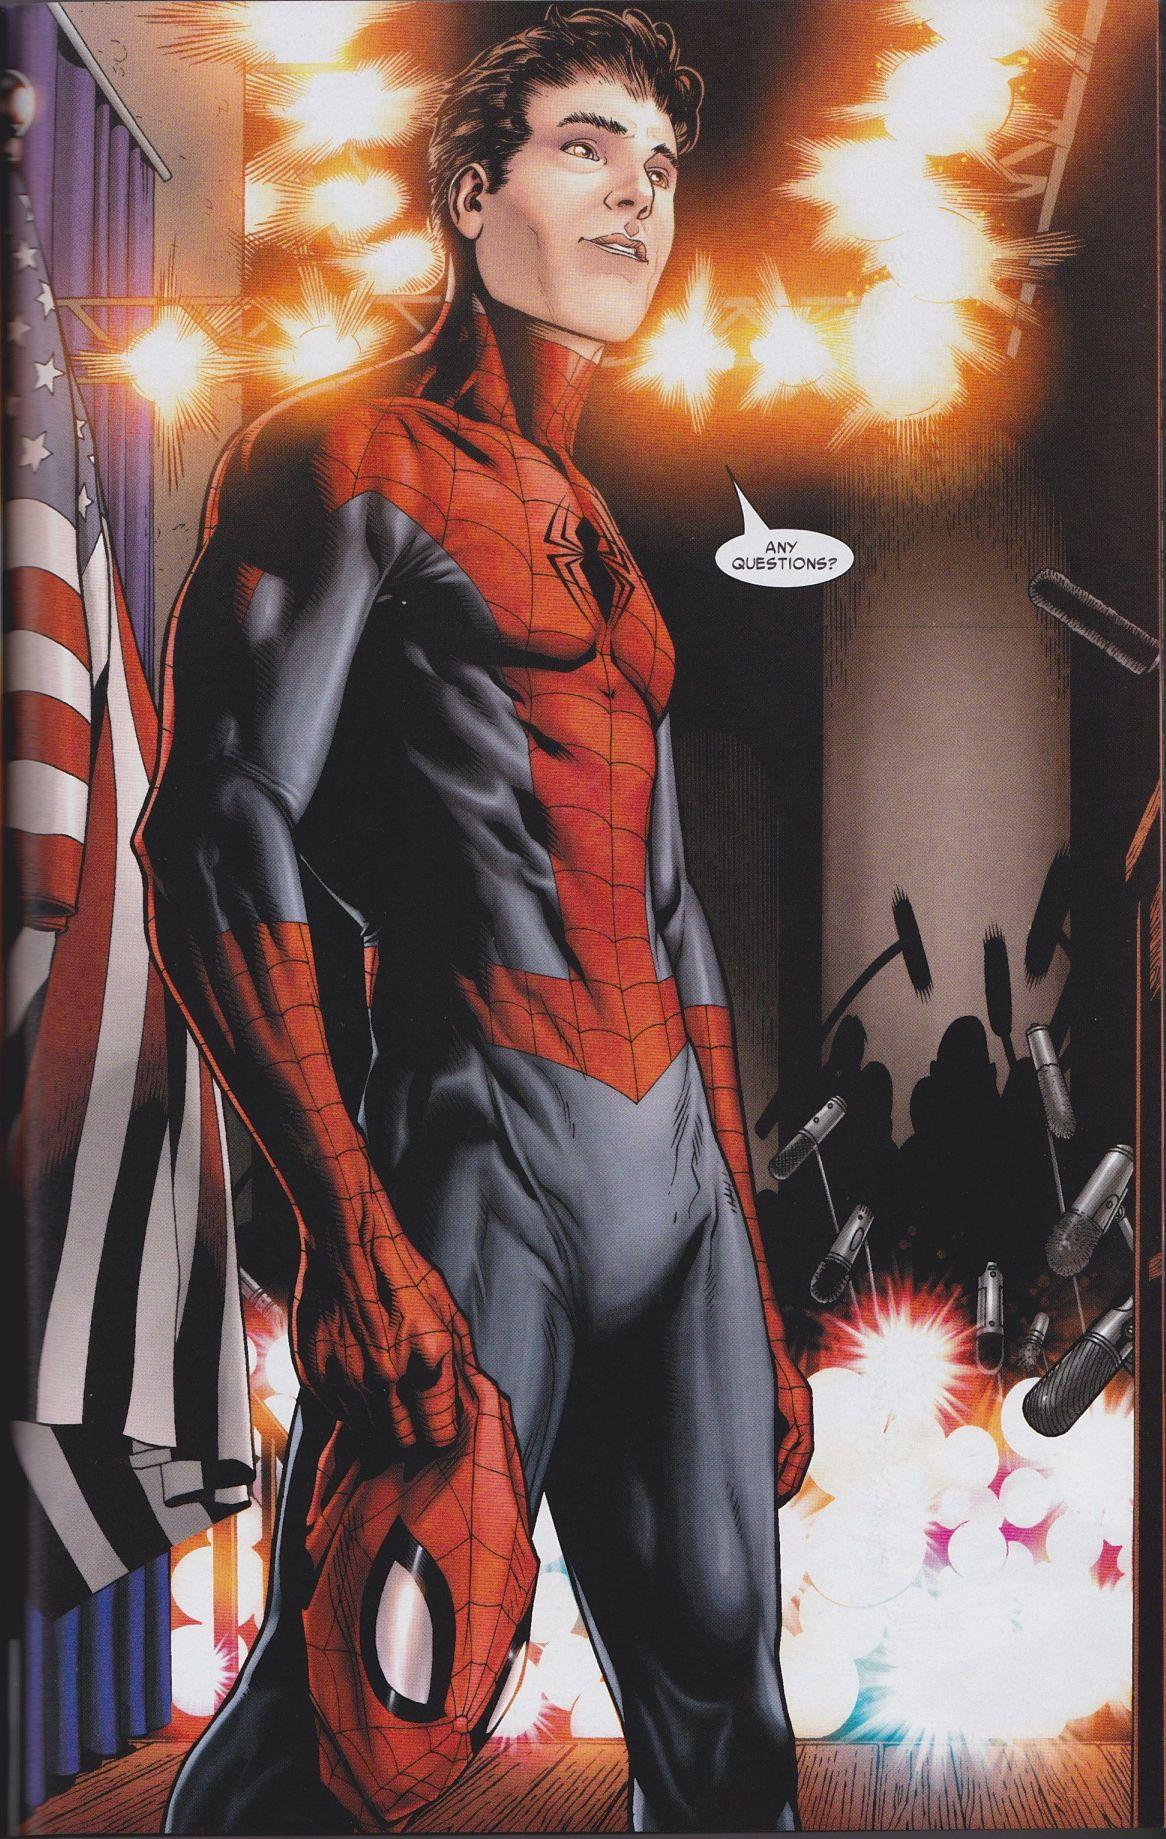 spider-man-press-conference-panel.jpg